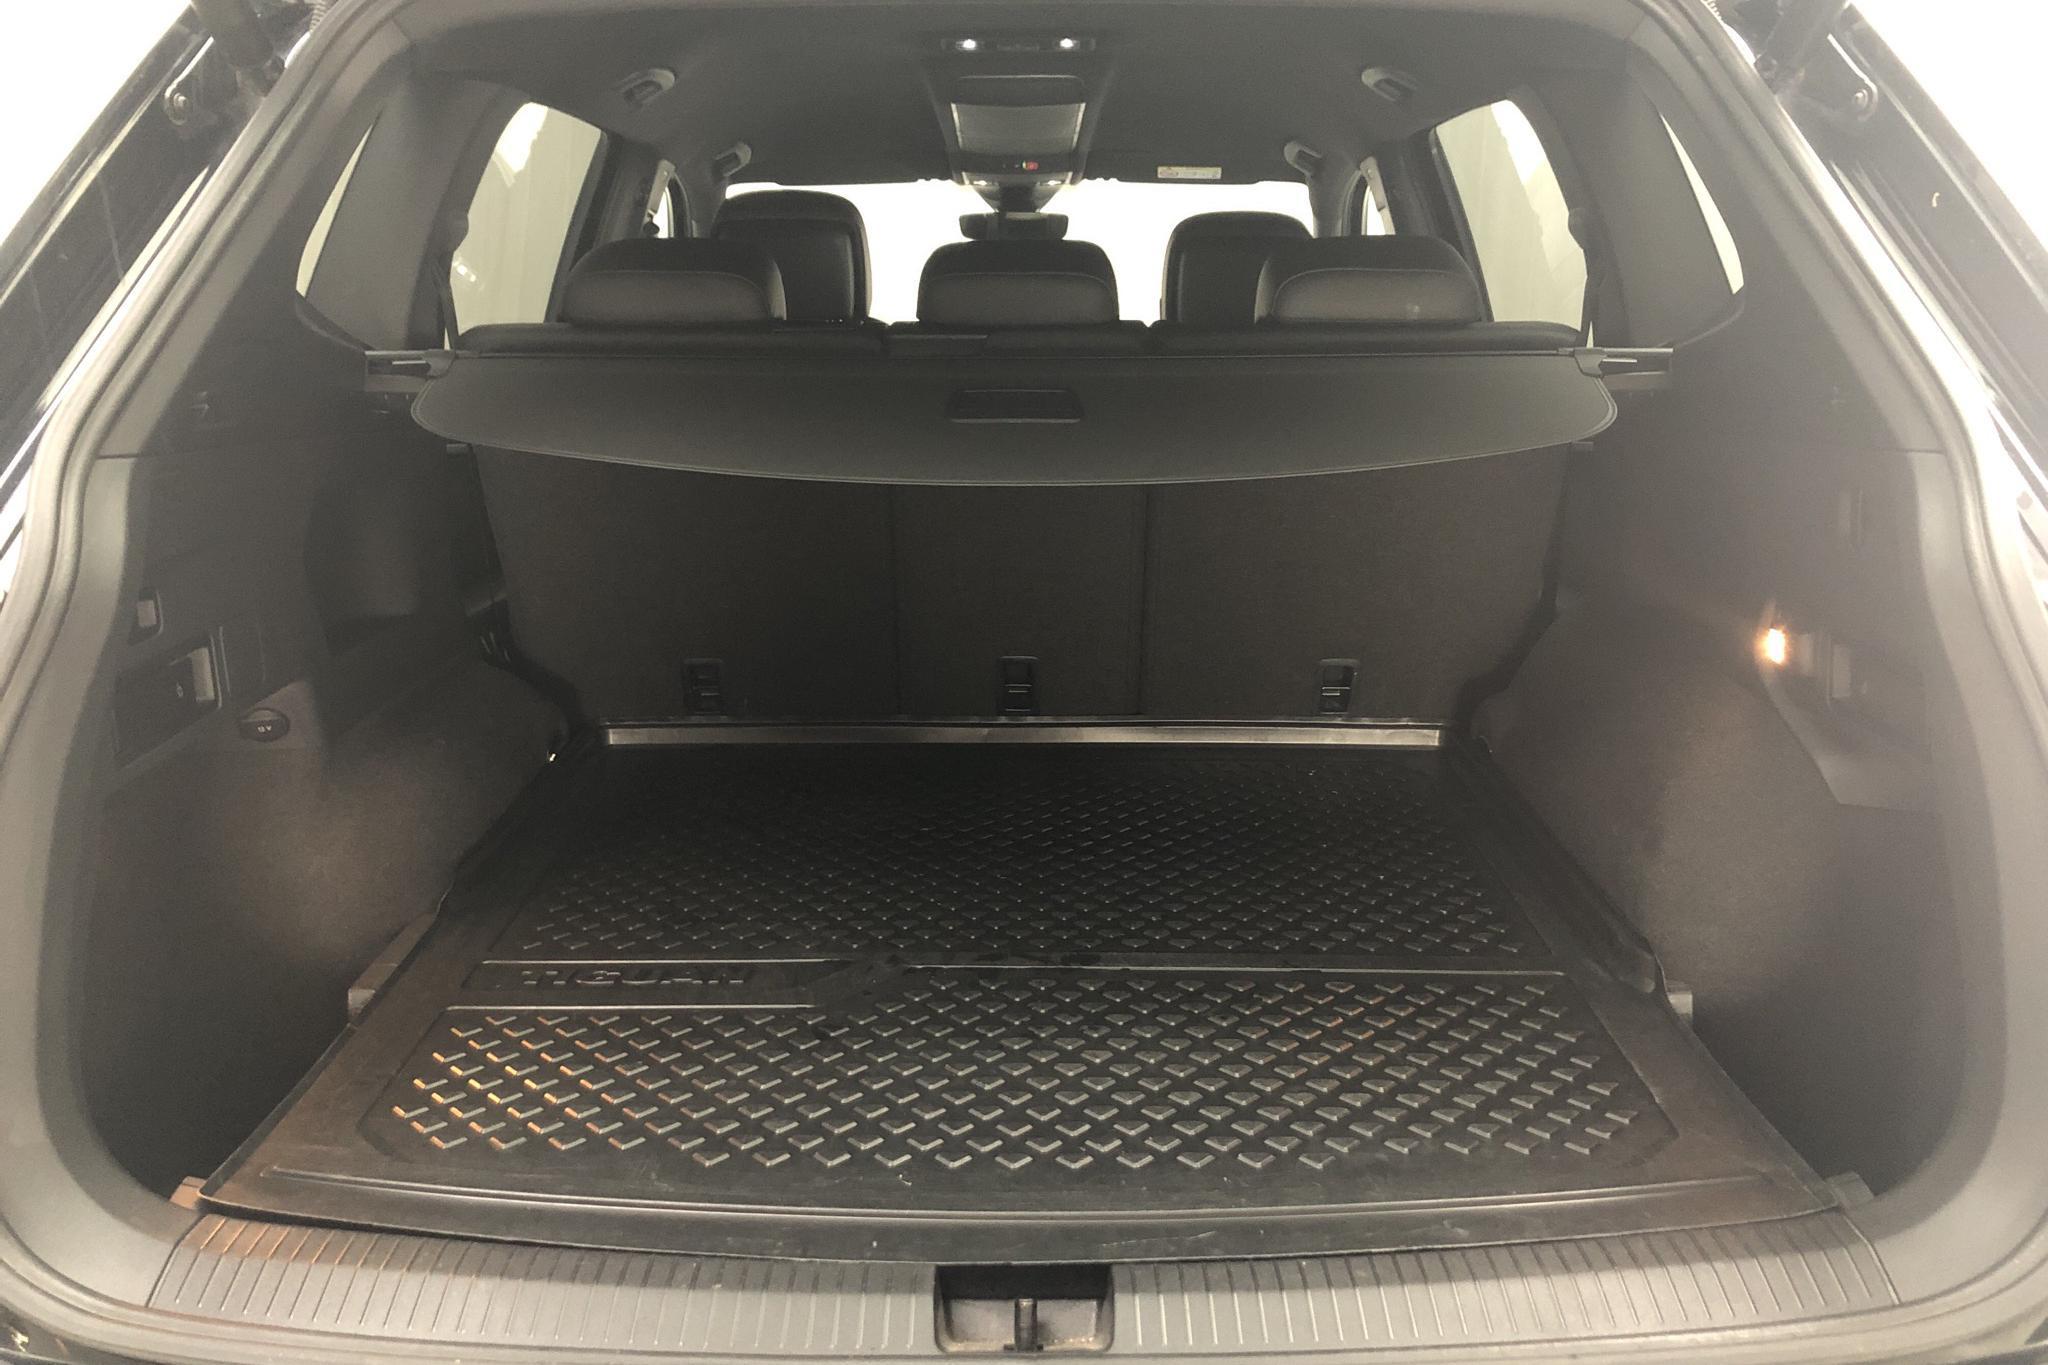 VW Tiguan Allspace 2.0 TDI 4MOTION (190hk) - 7 060 mil - Automat - svart - 2018